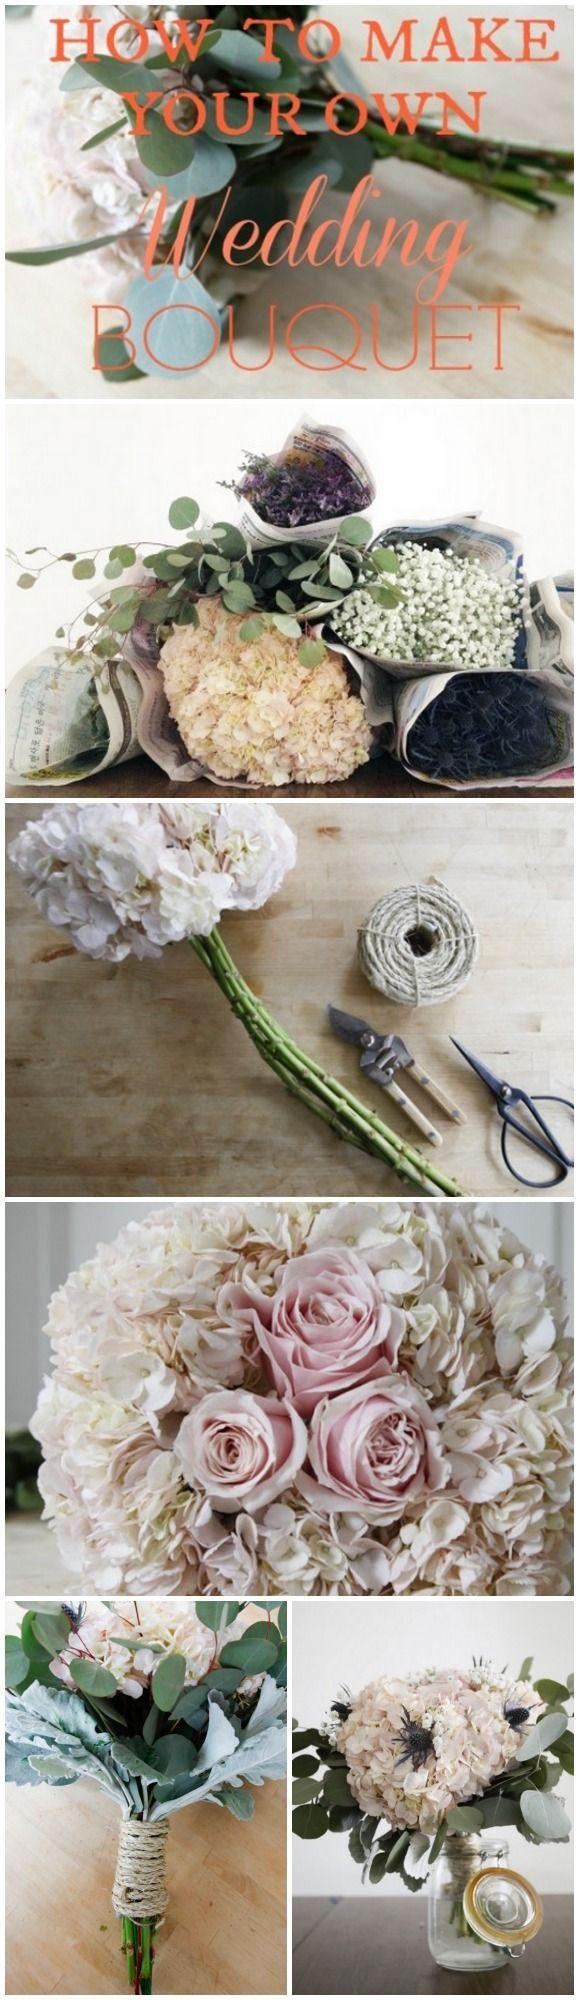 Fácil paso a paso de cómo hacer tu propio ramo de boda  -  Easy Step By Step How To Make Your Own Bouquet wedding.